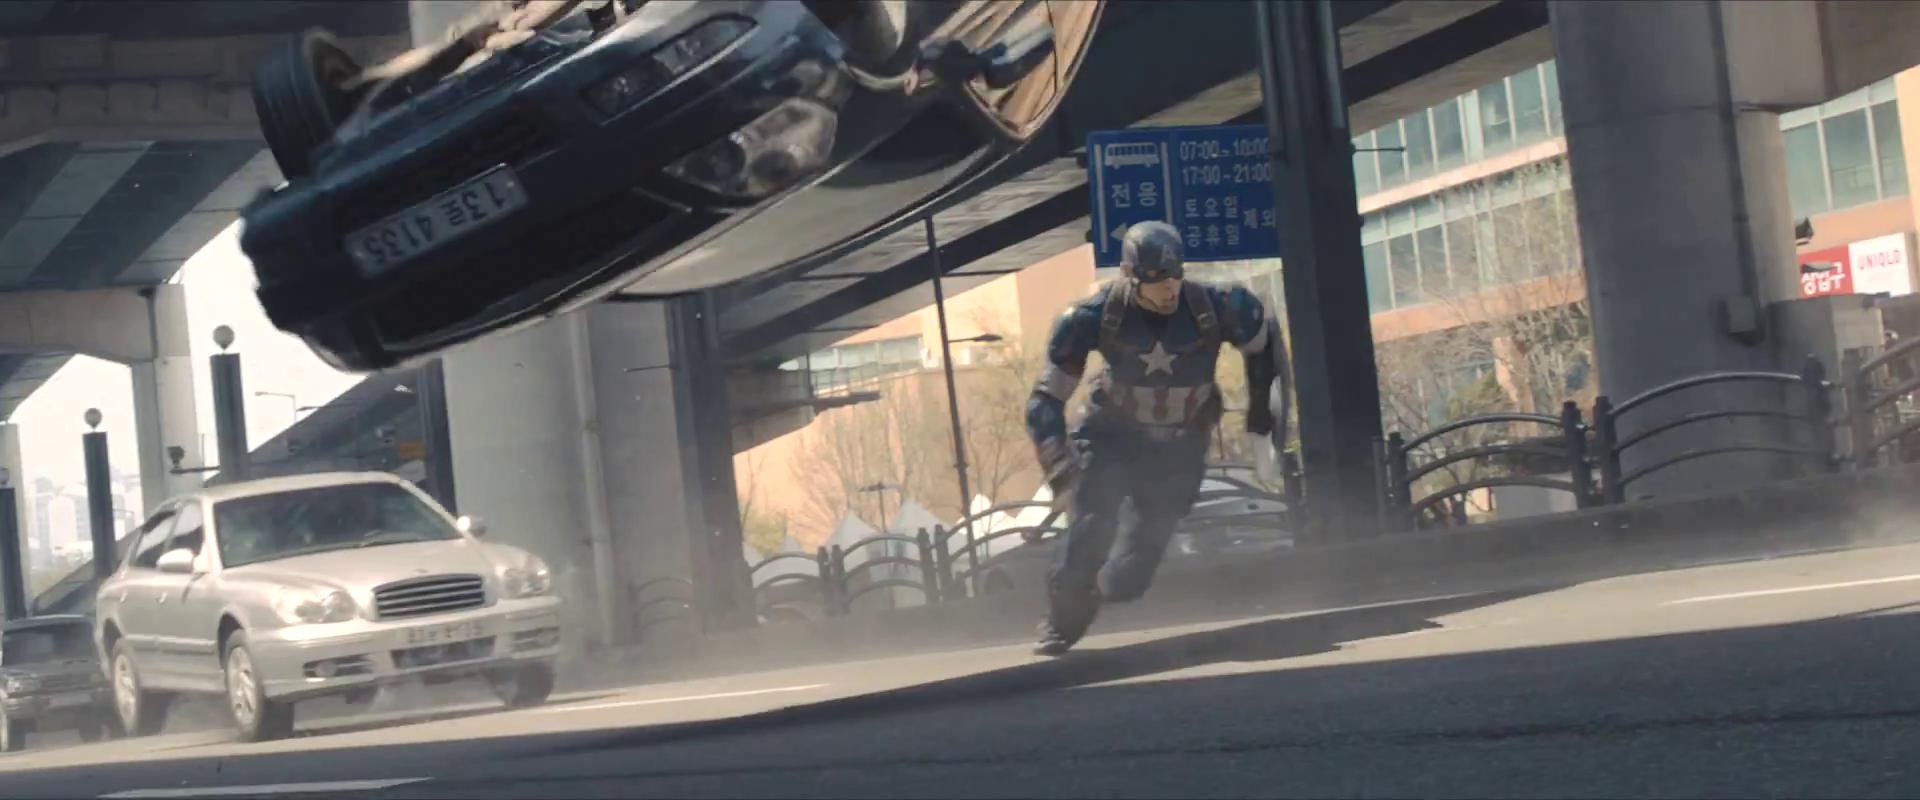 avengers-age-of-ultron-trailer-screengrab-28-captain-america.png